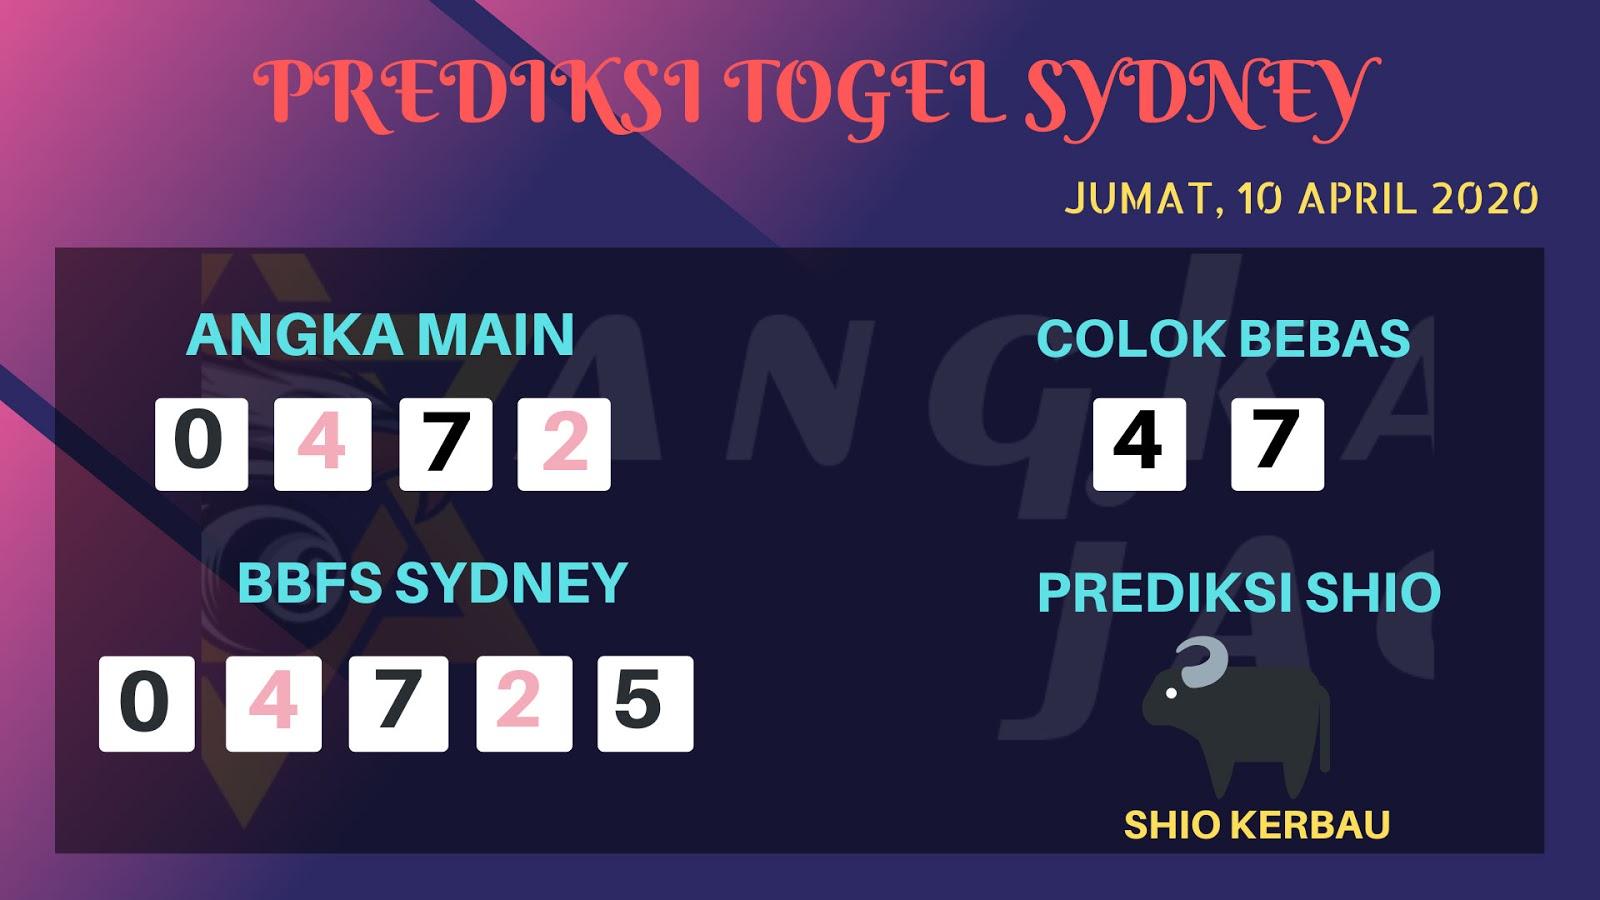 Syair Sidney Jumat 10 April 2020 - Prediksi Angka Sidney